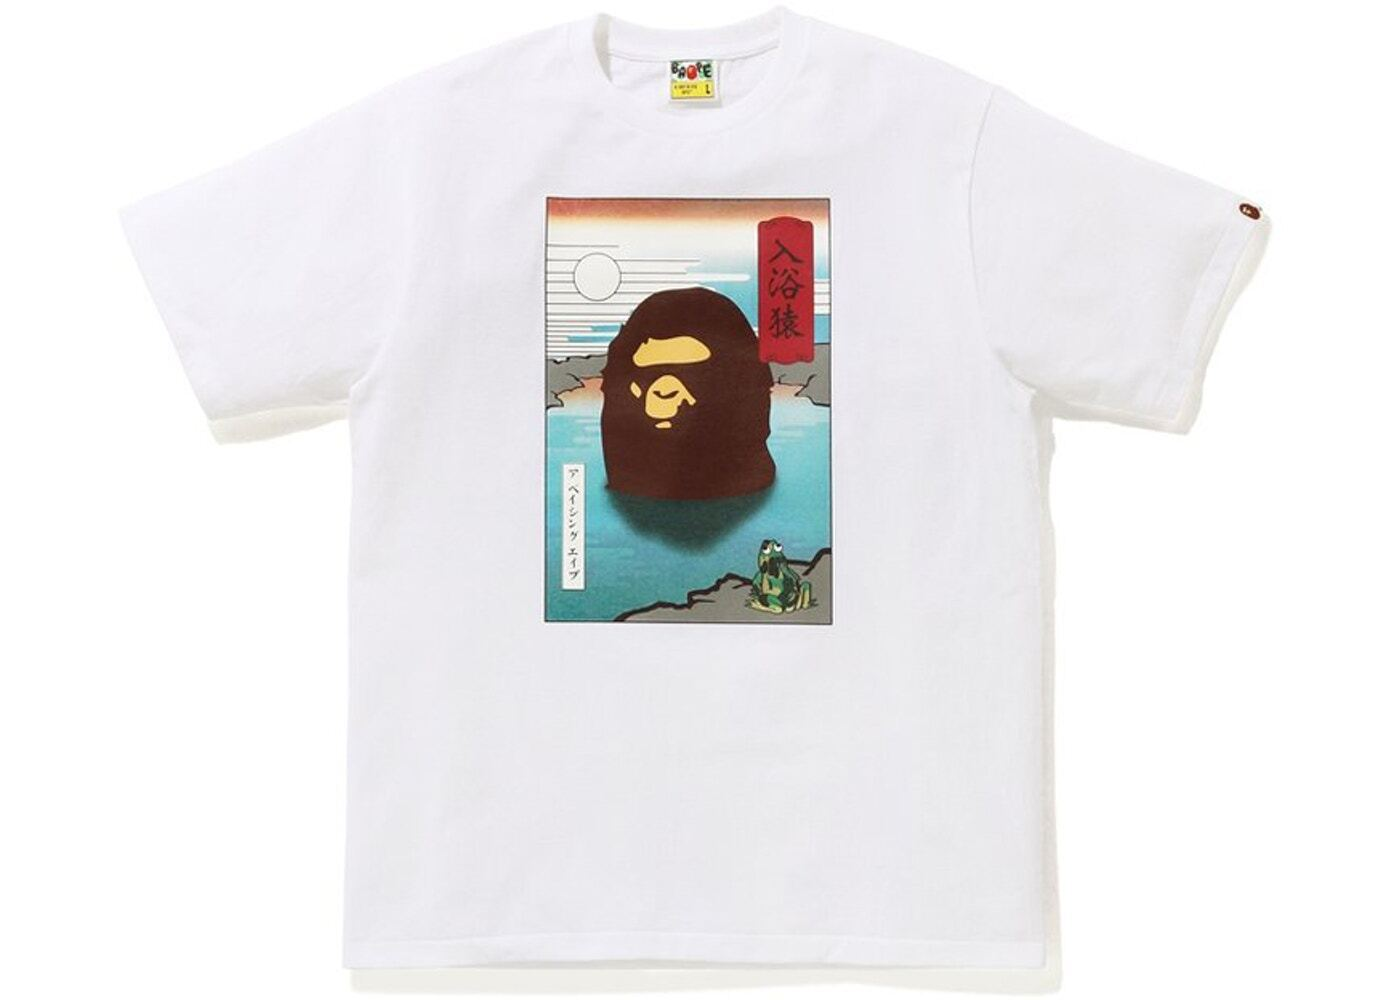 BAPE Japan A Bathing Ape Tee White (SS21)の写真